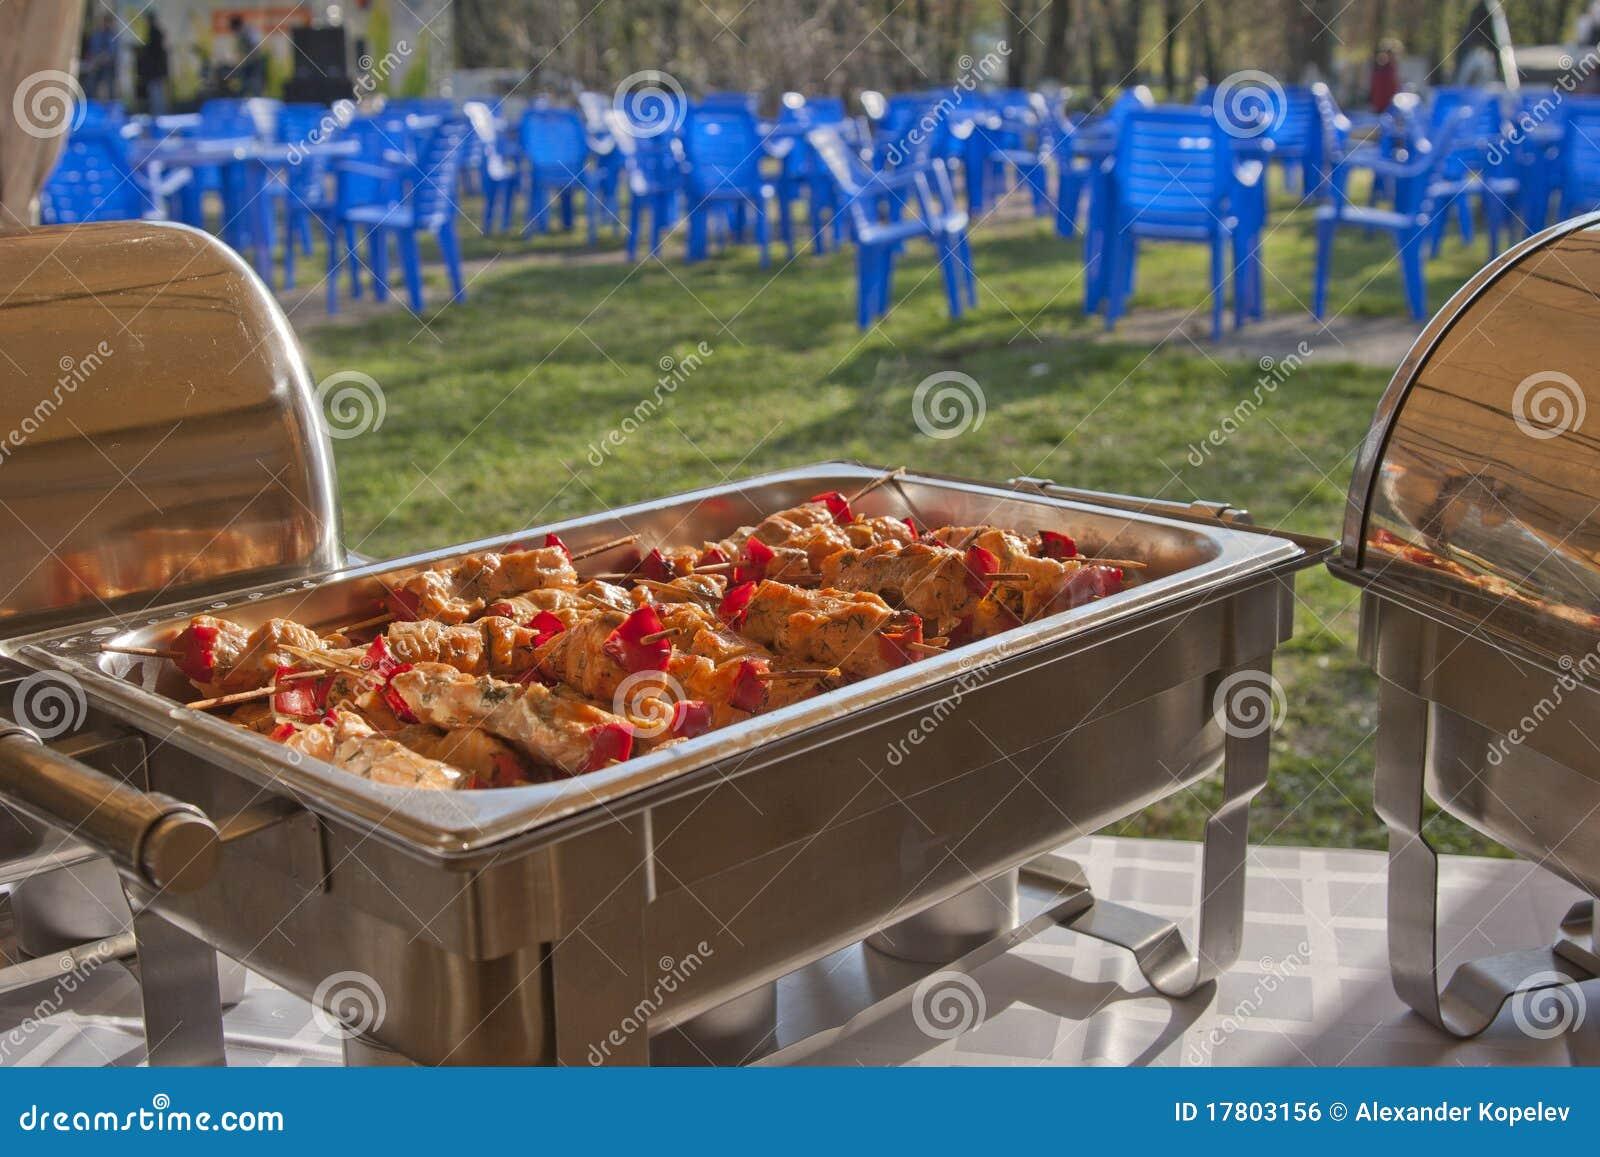 Patio Picnic Catering